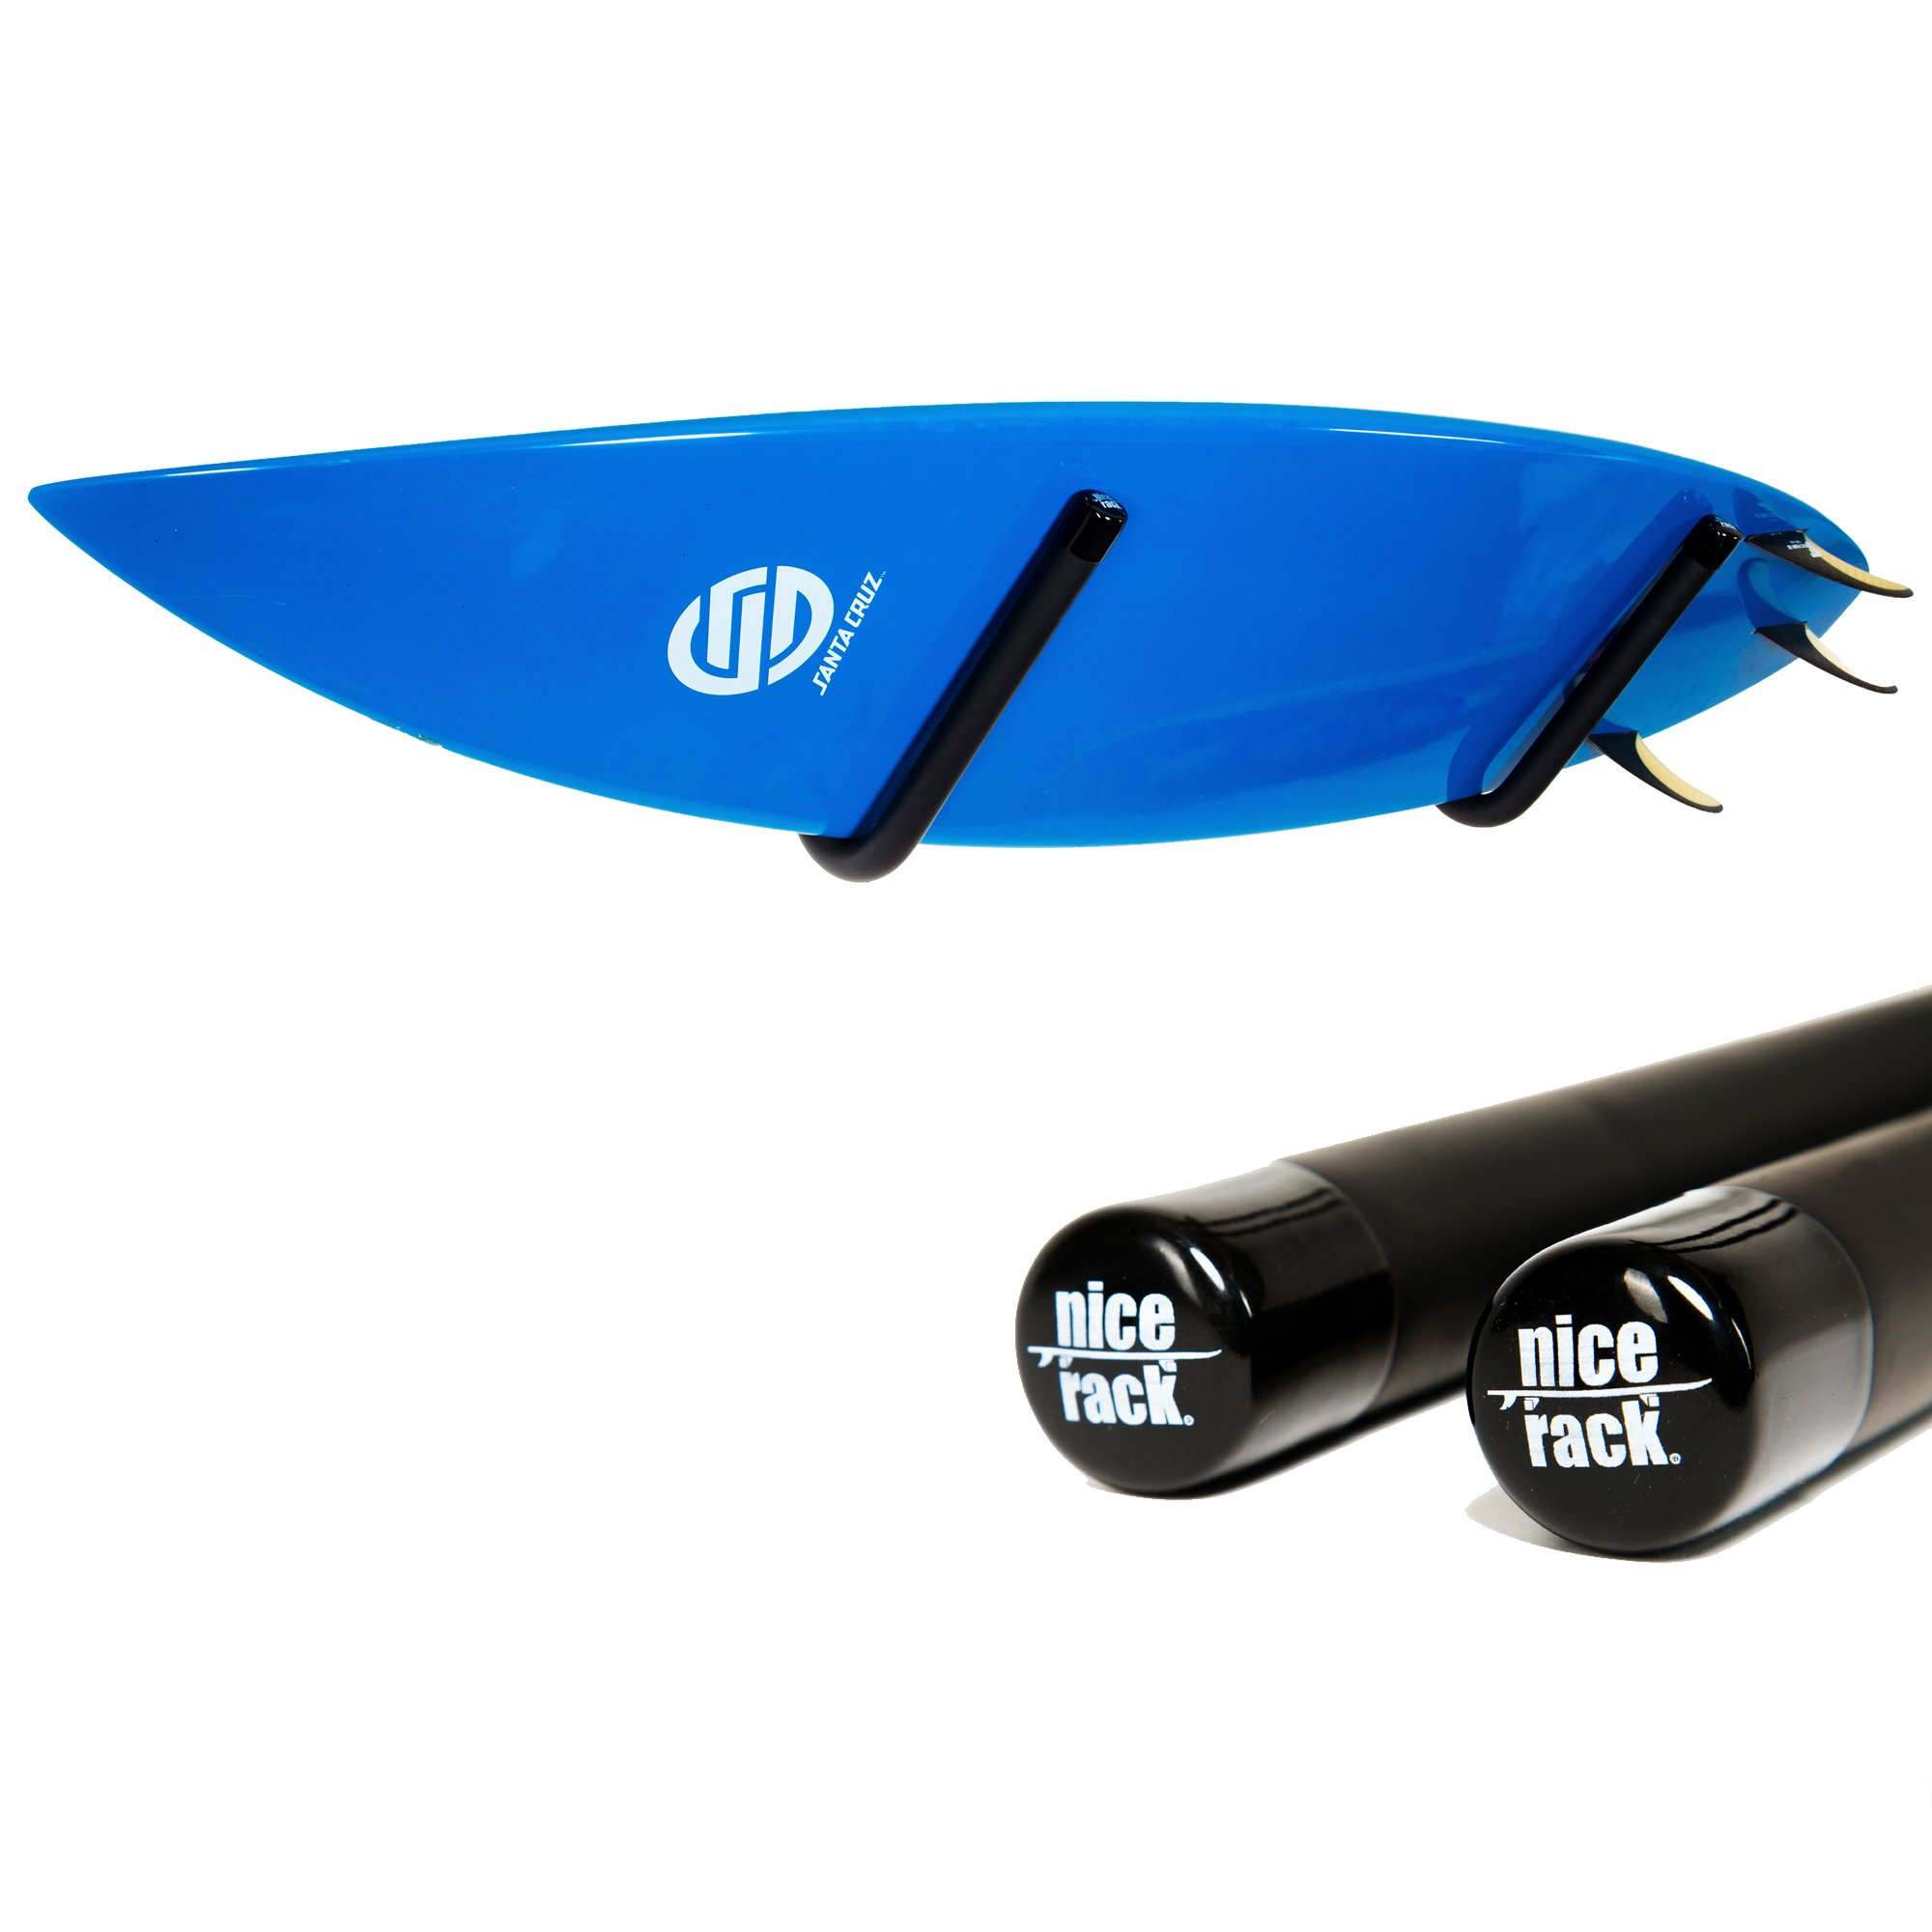 Nice Rack - Surfboard & Longboard Angled Rack - High Strength